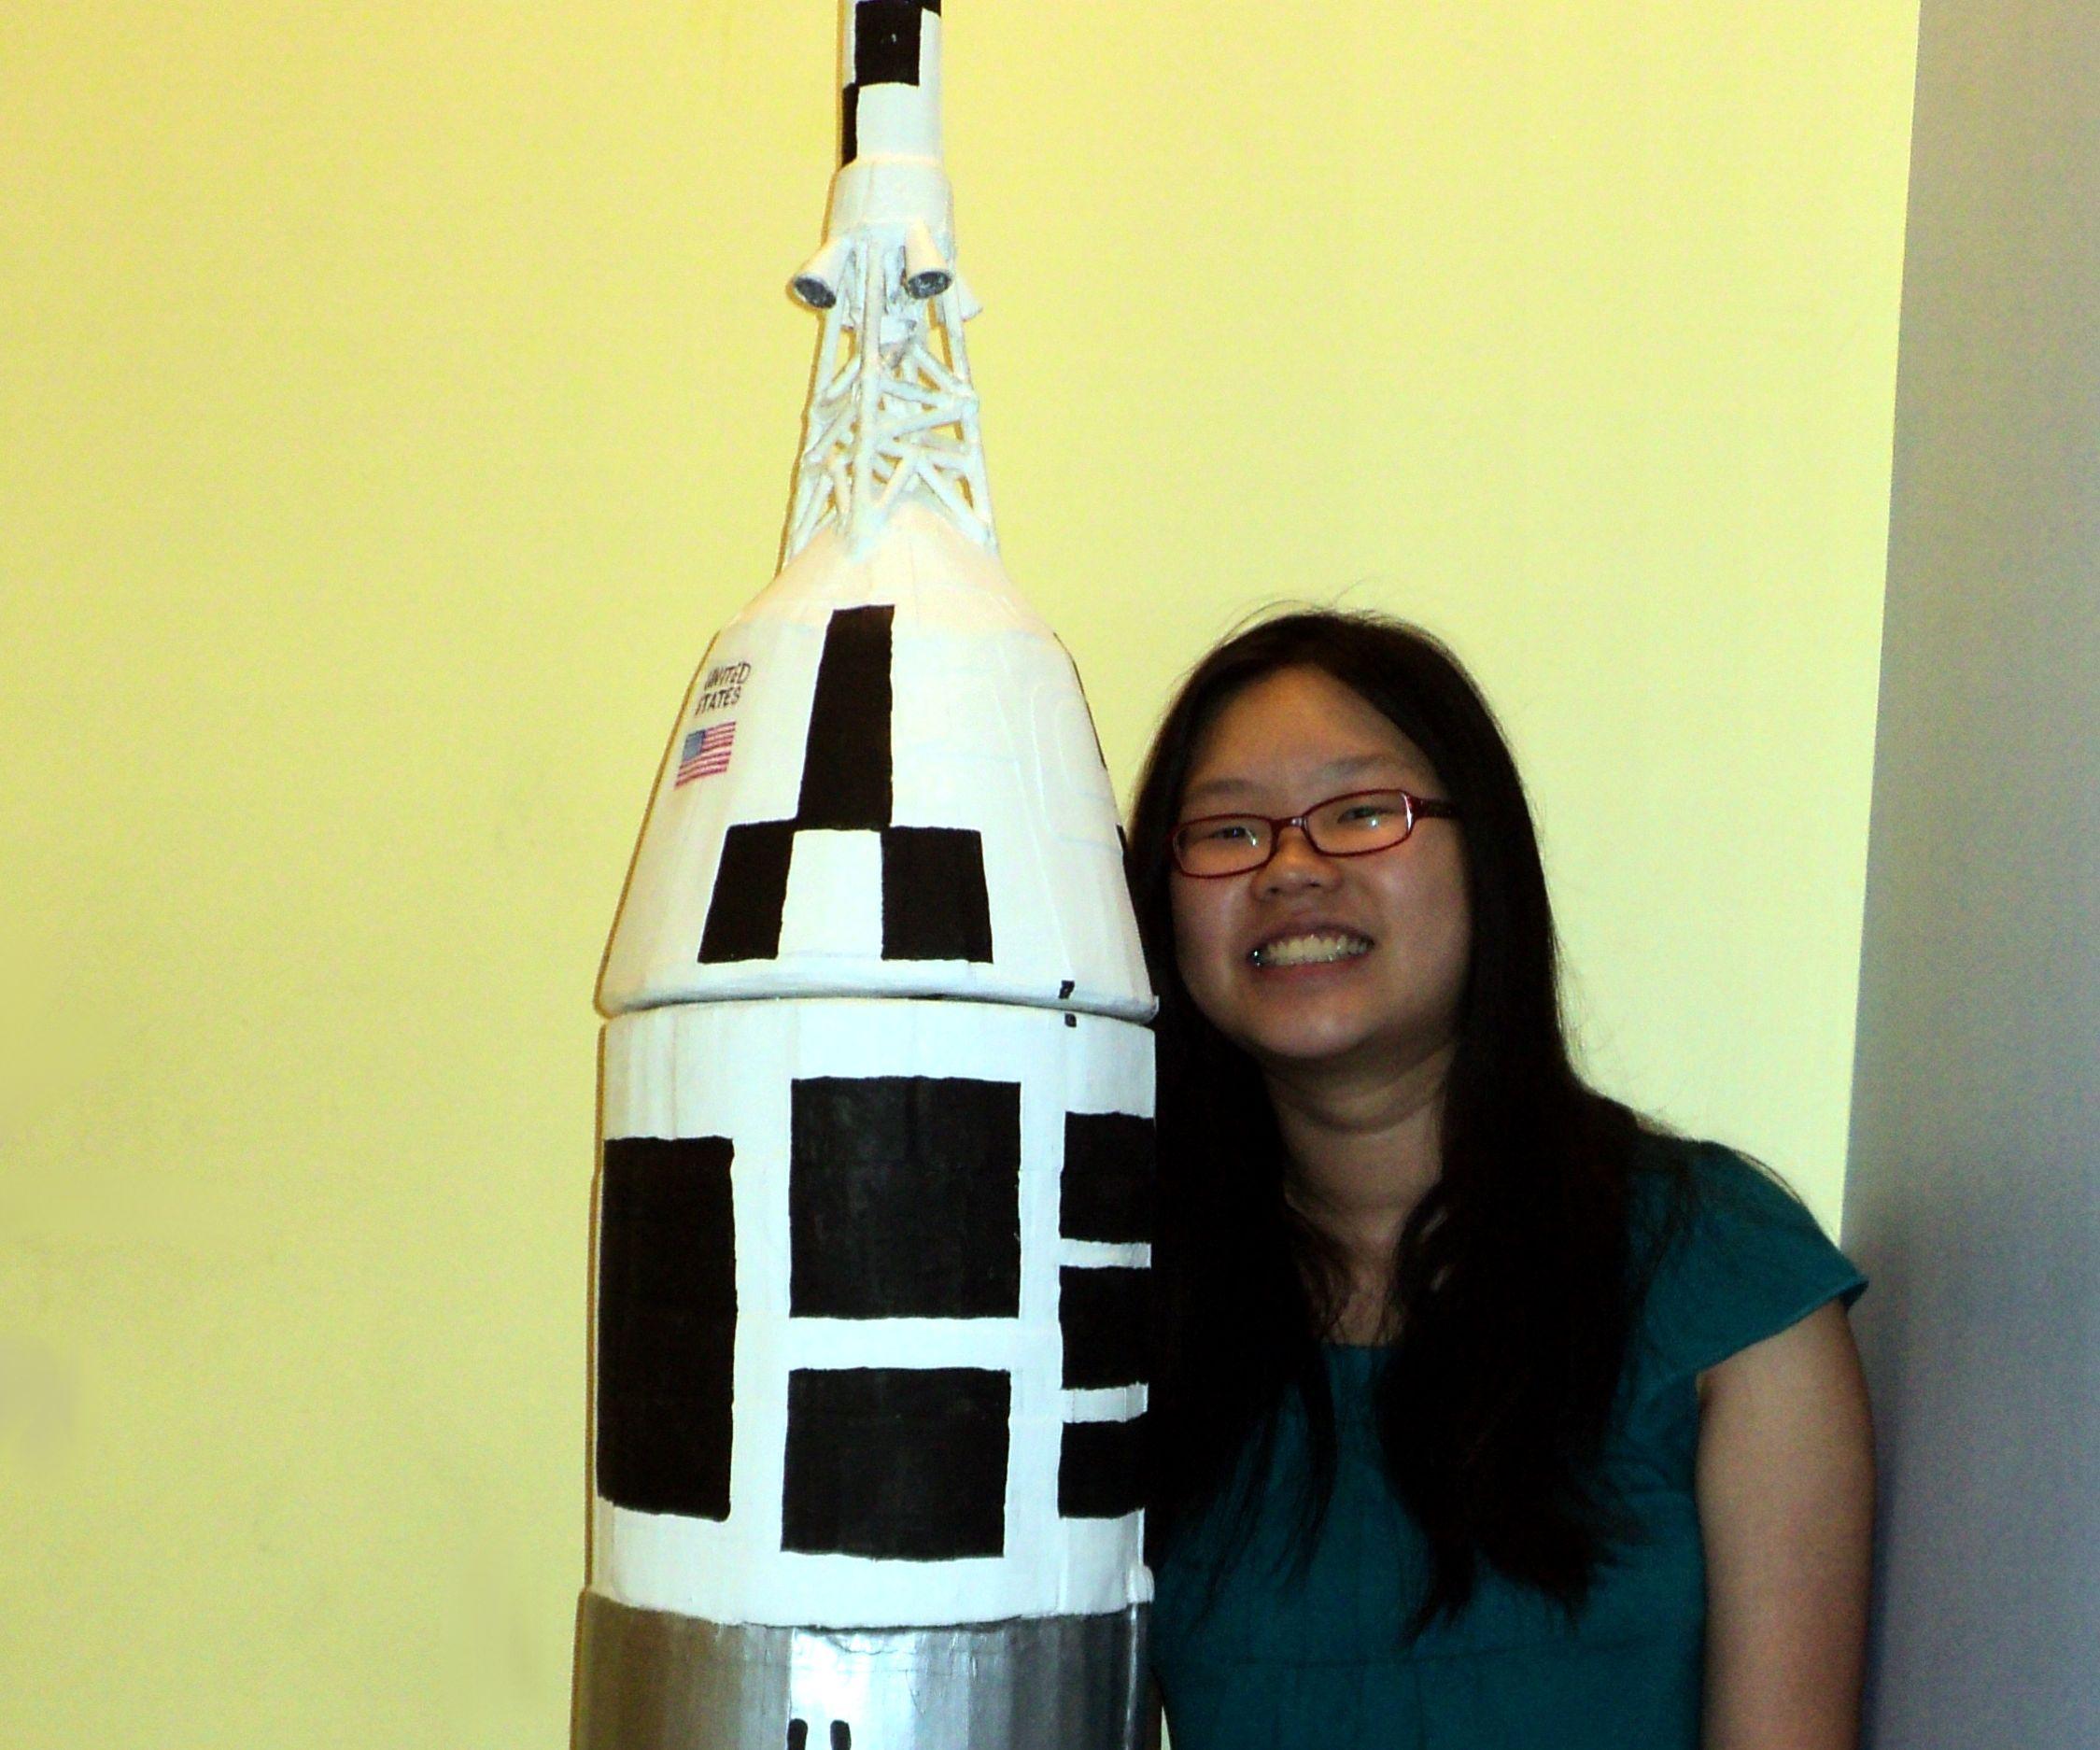 Build Scale Model Rockets